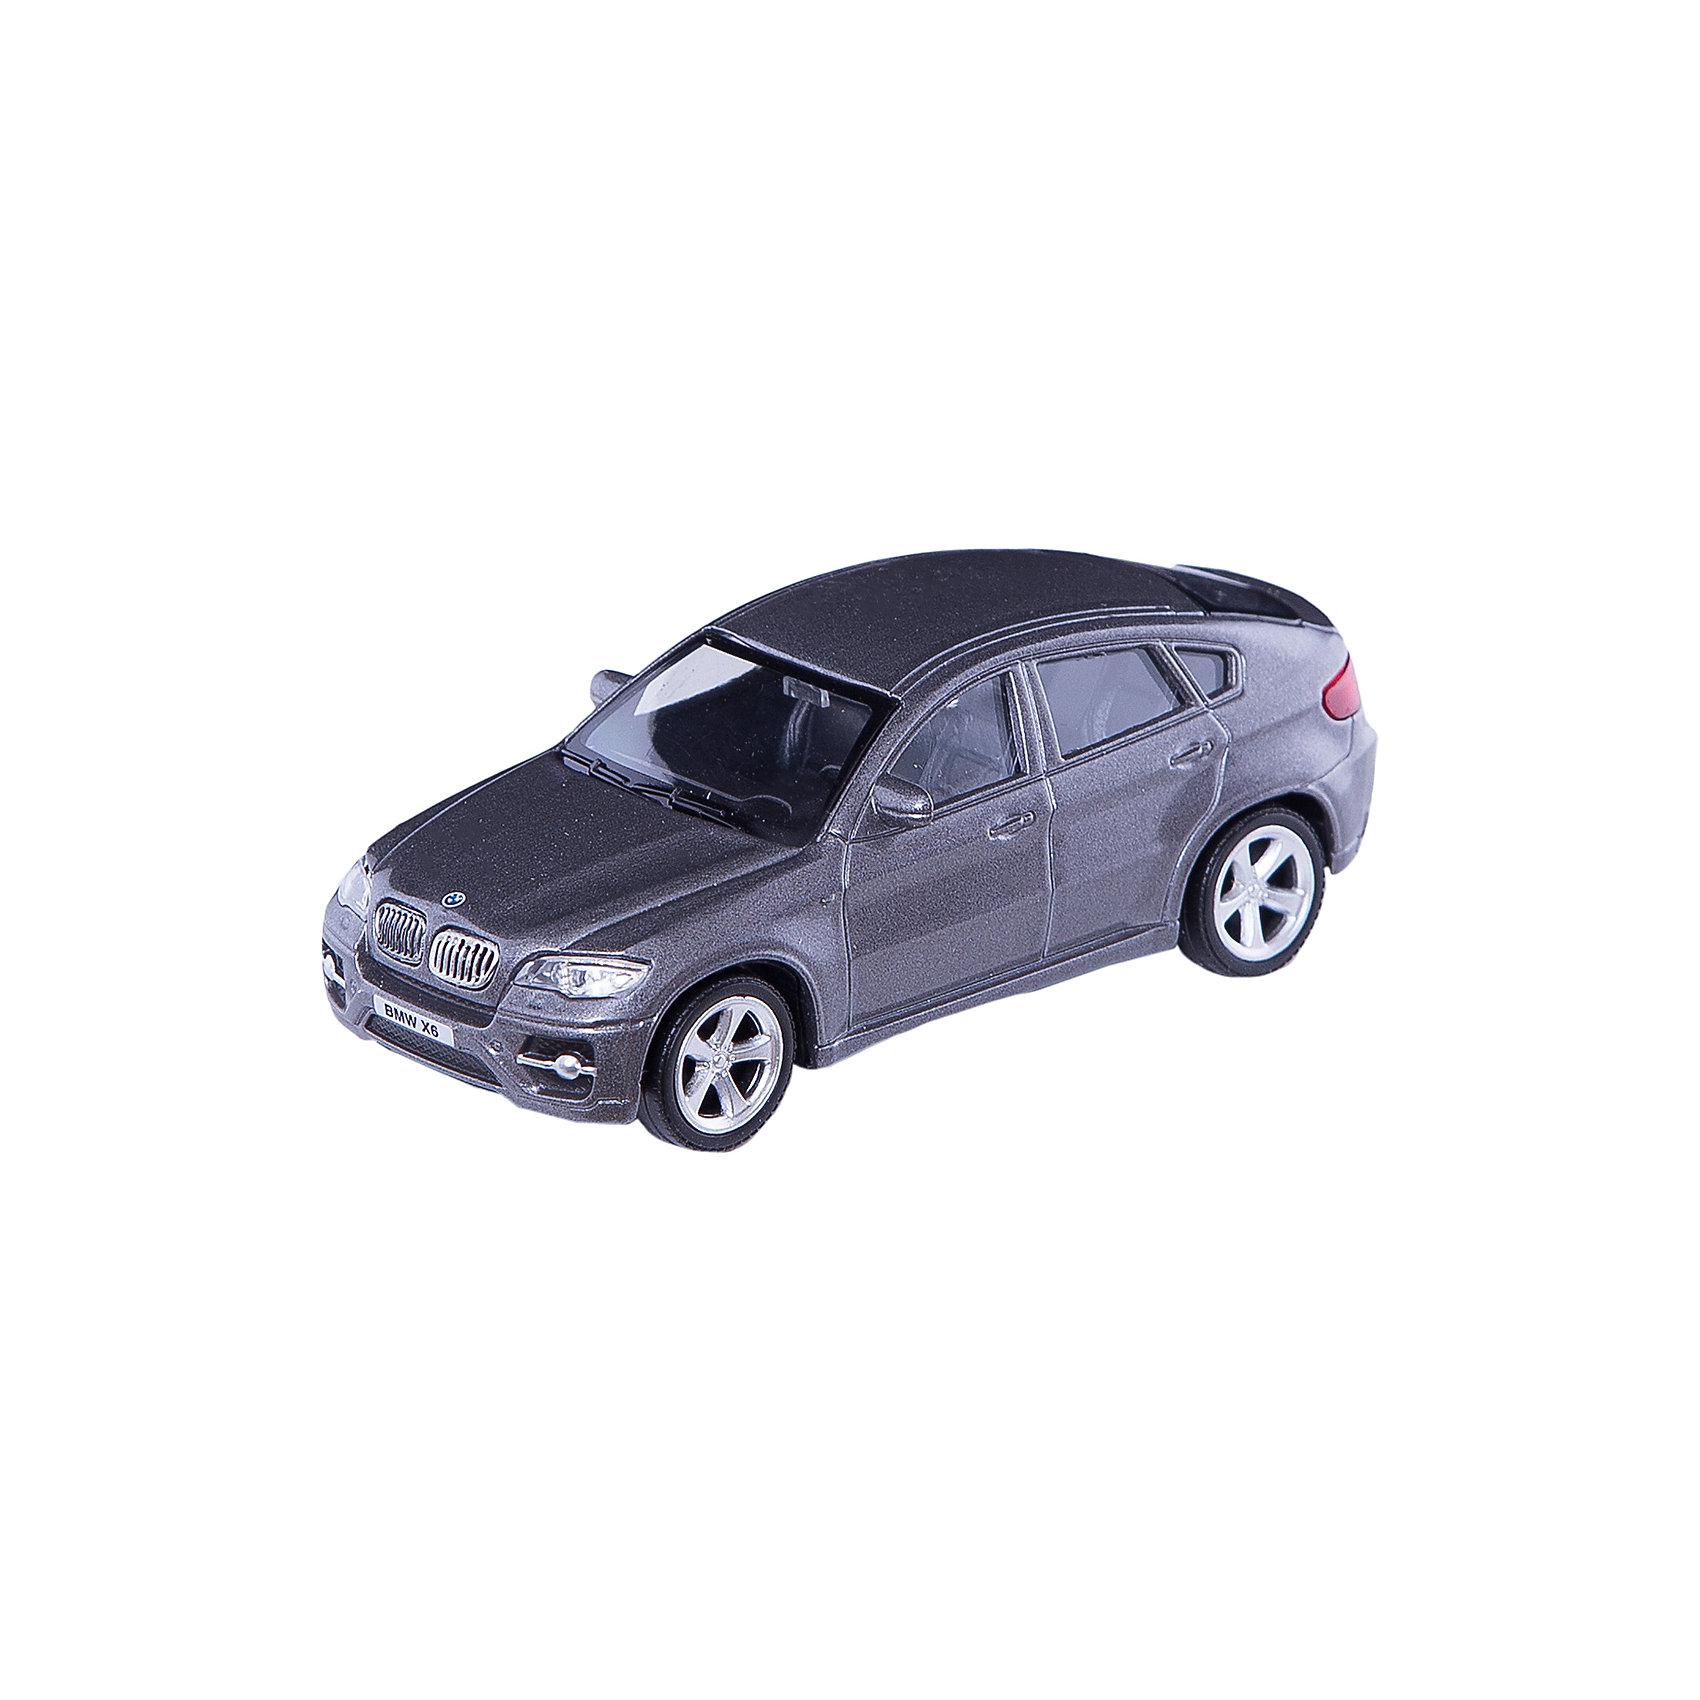 Машинка BMW X6 1:43, AutotimeМашинки<br><br><br>Ширина мм: 165<br>Глубина мм: 57<br>Высота мм: 75<br>Вес г: 13<br>Возраст от месяцев: 36<br>Возраст до месяцев: 2147483647<br>Пол: Мужской<br>Возраст: Детский<br>SKU: 5584089